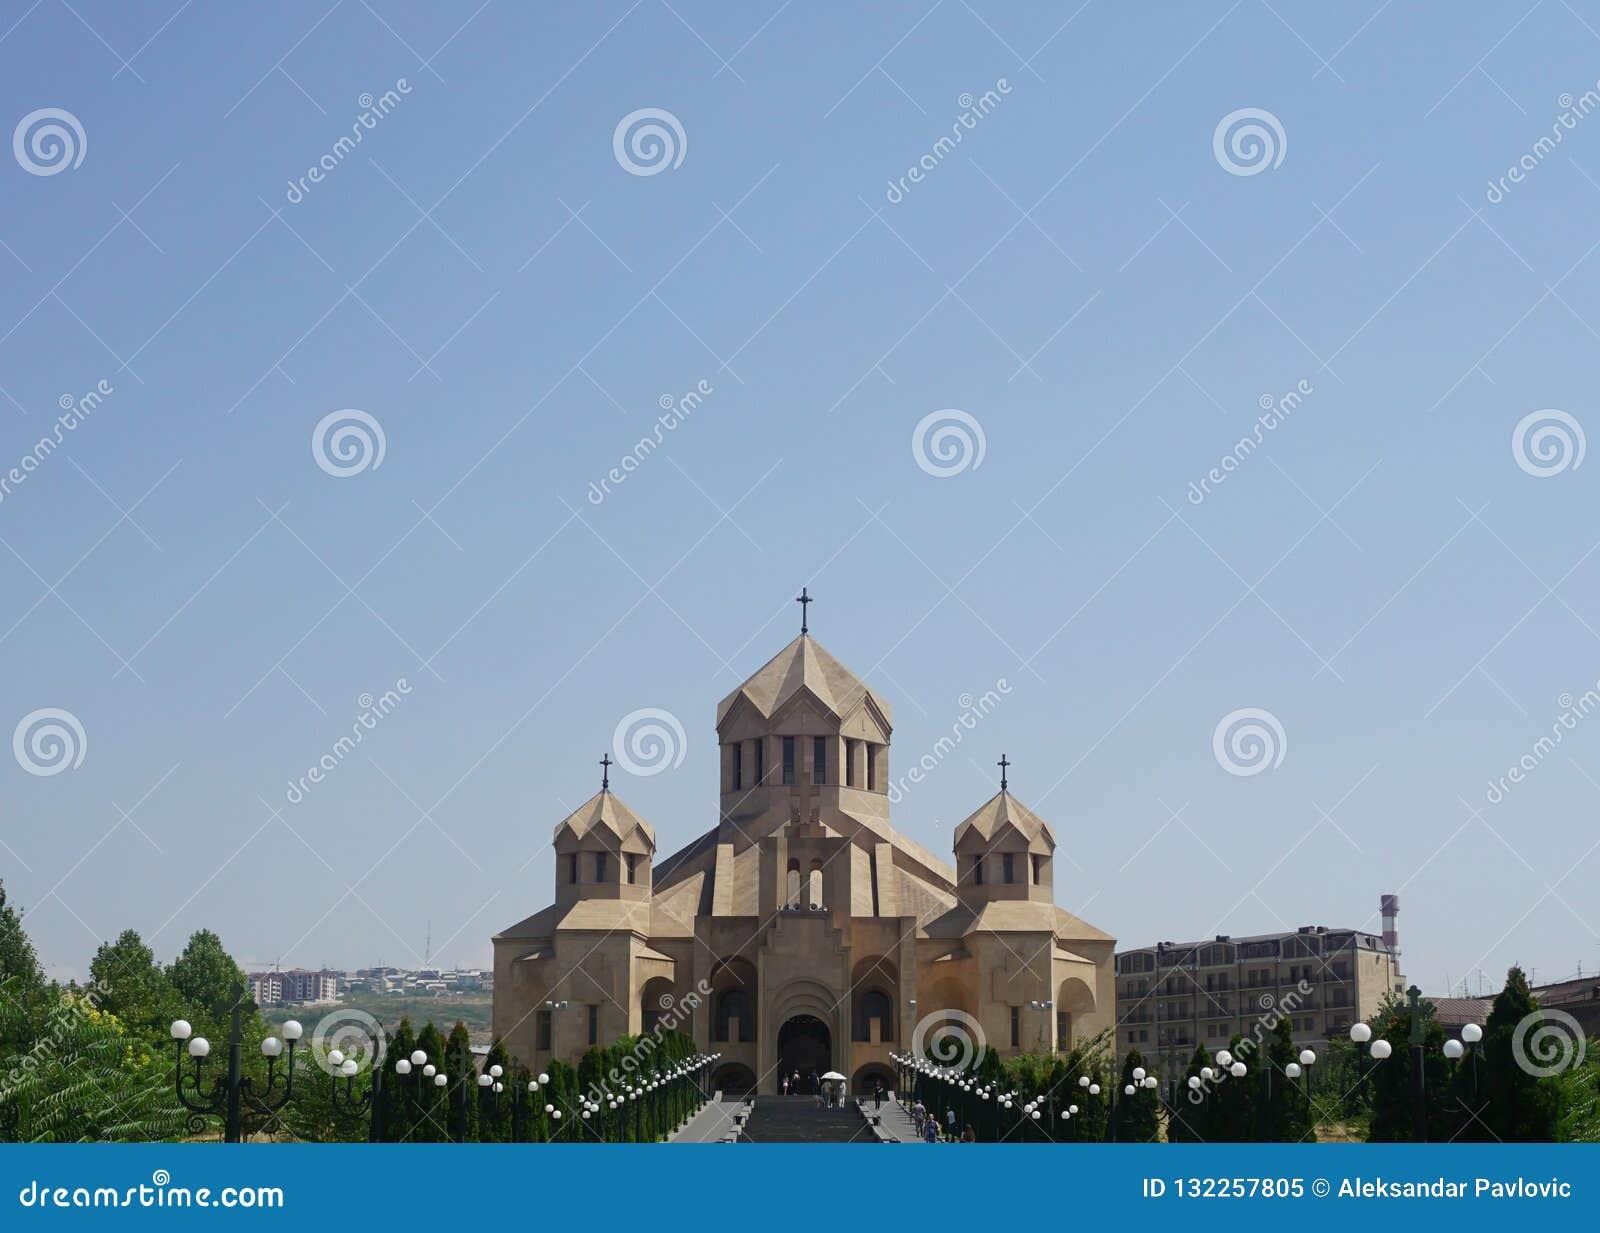 Yerevan Saint Gregory the Illuminator Cathedral View